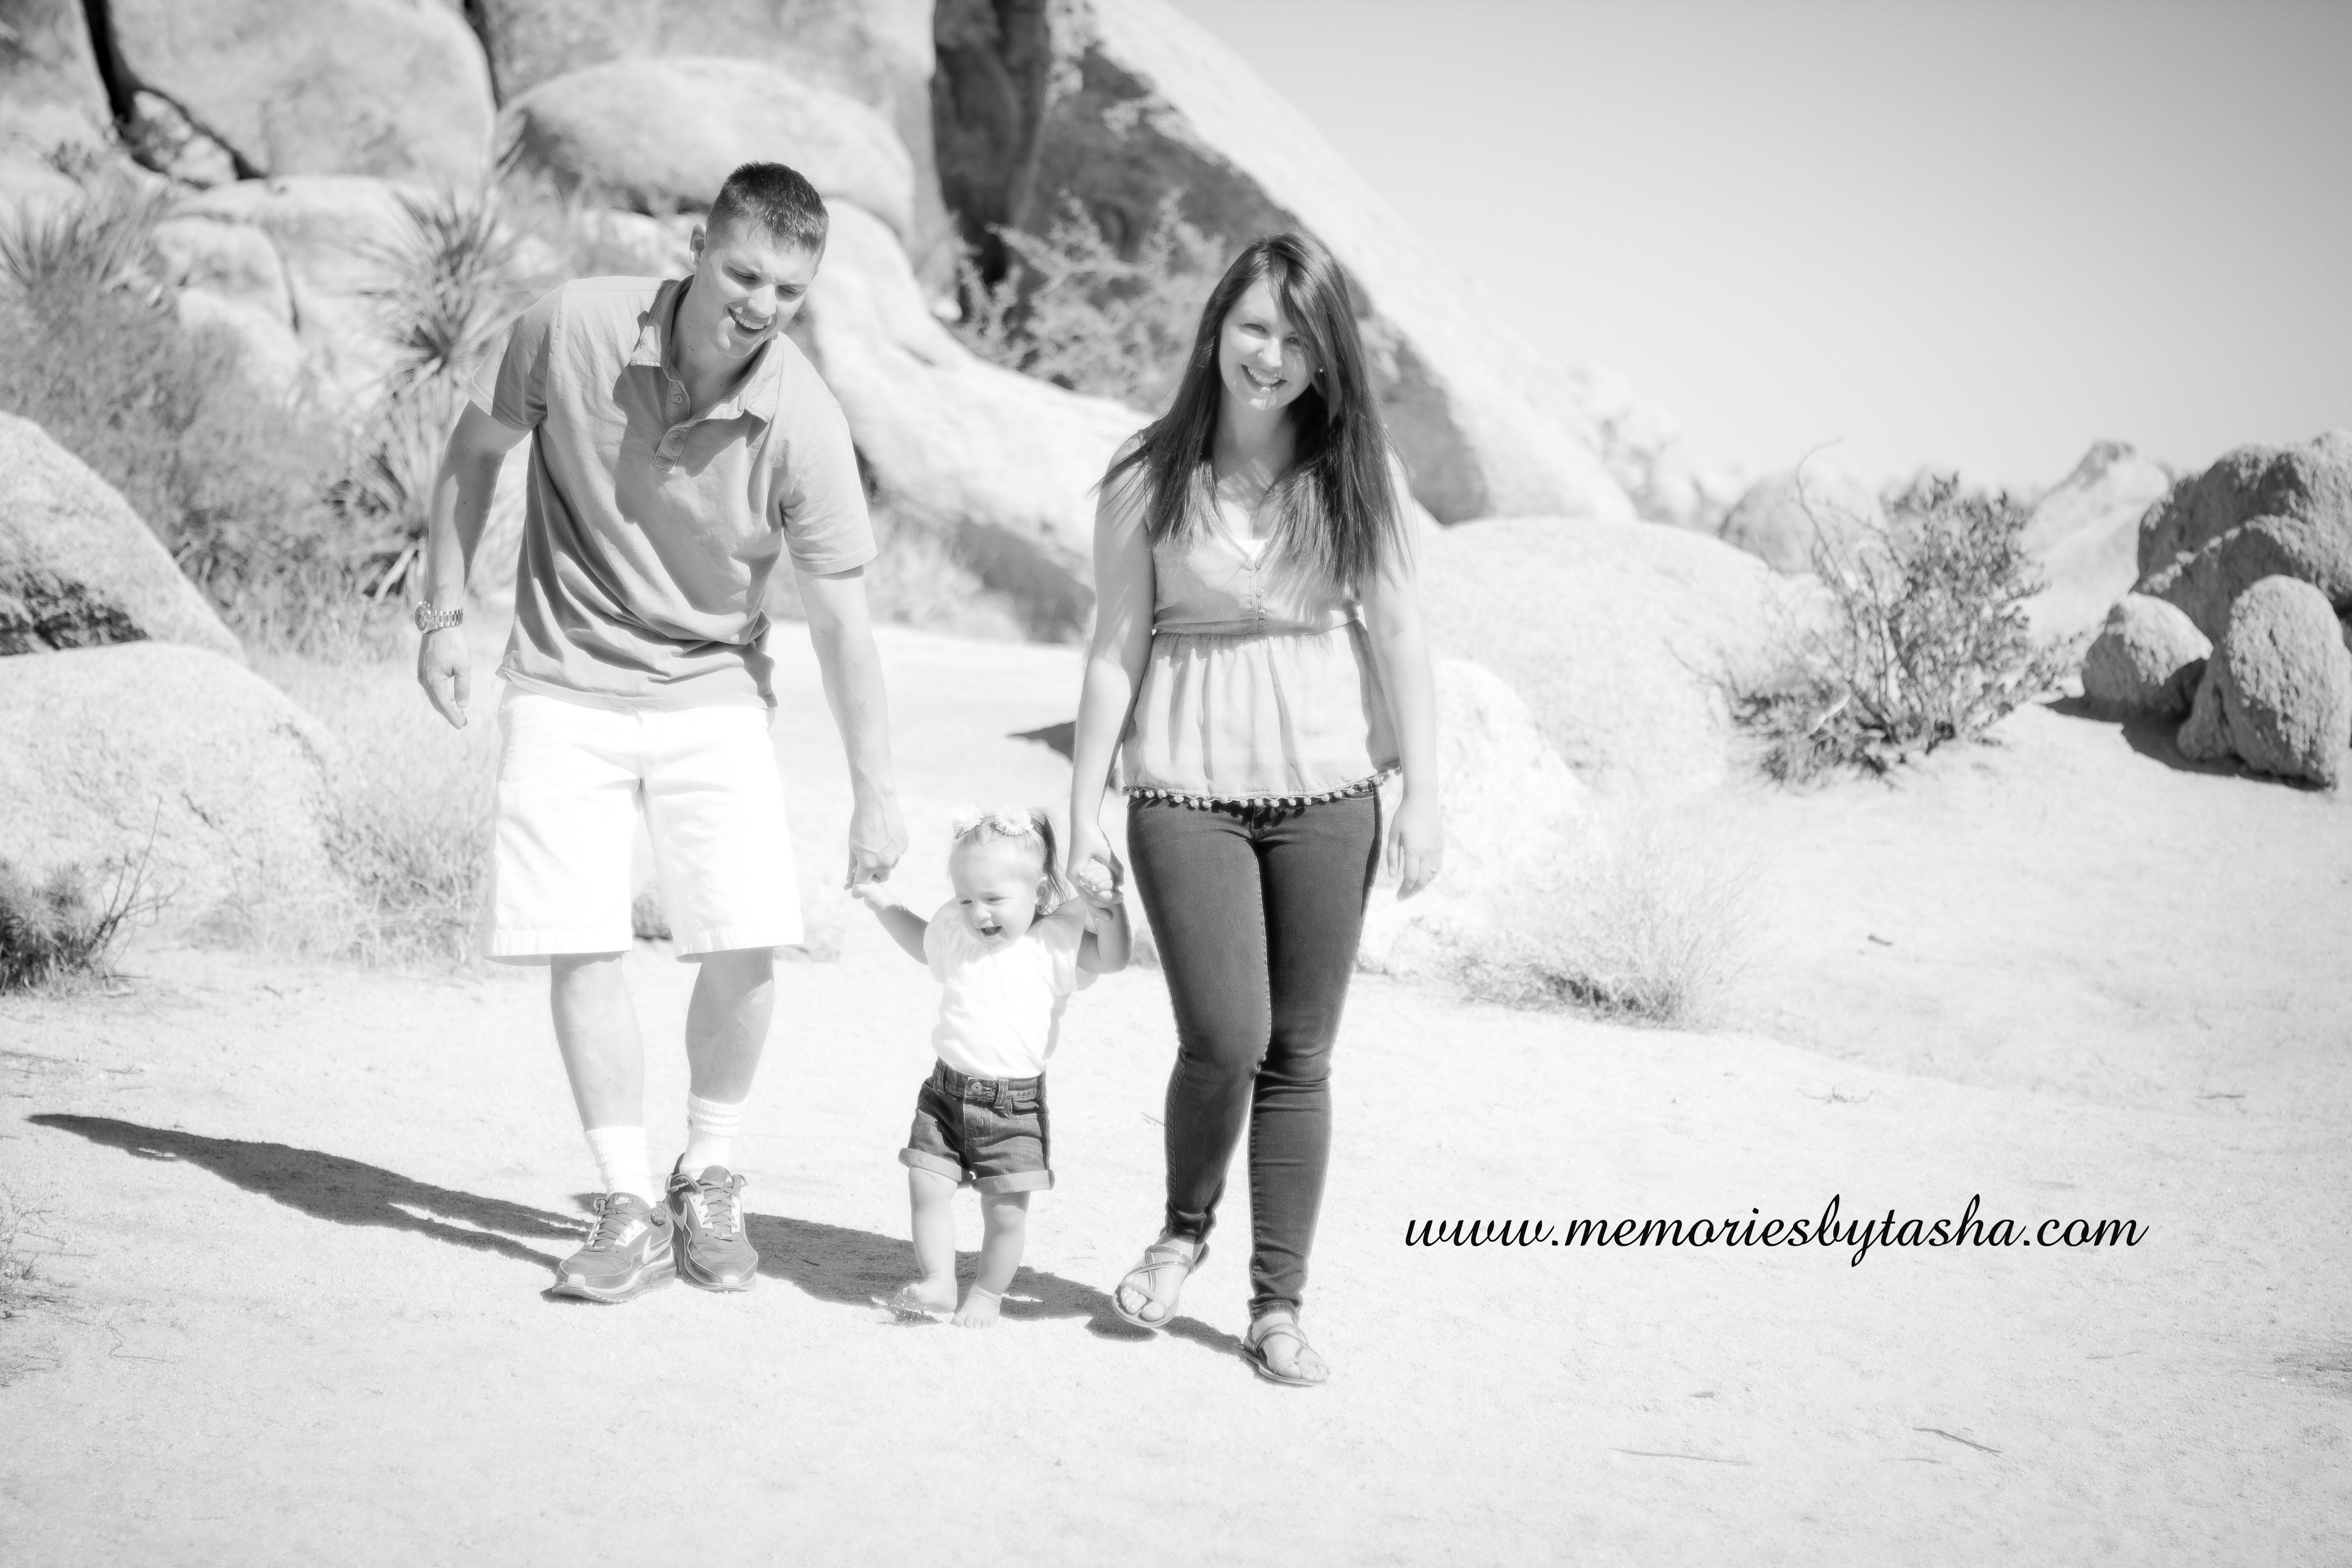 Twentynine Palms Photographer - Couples Photography - Family Photography - Children's Photography - Cake Smash-09